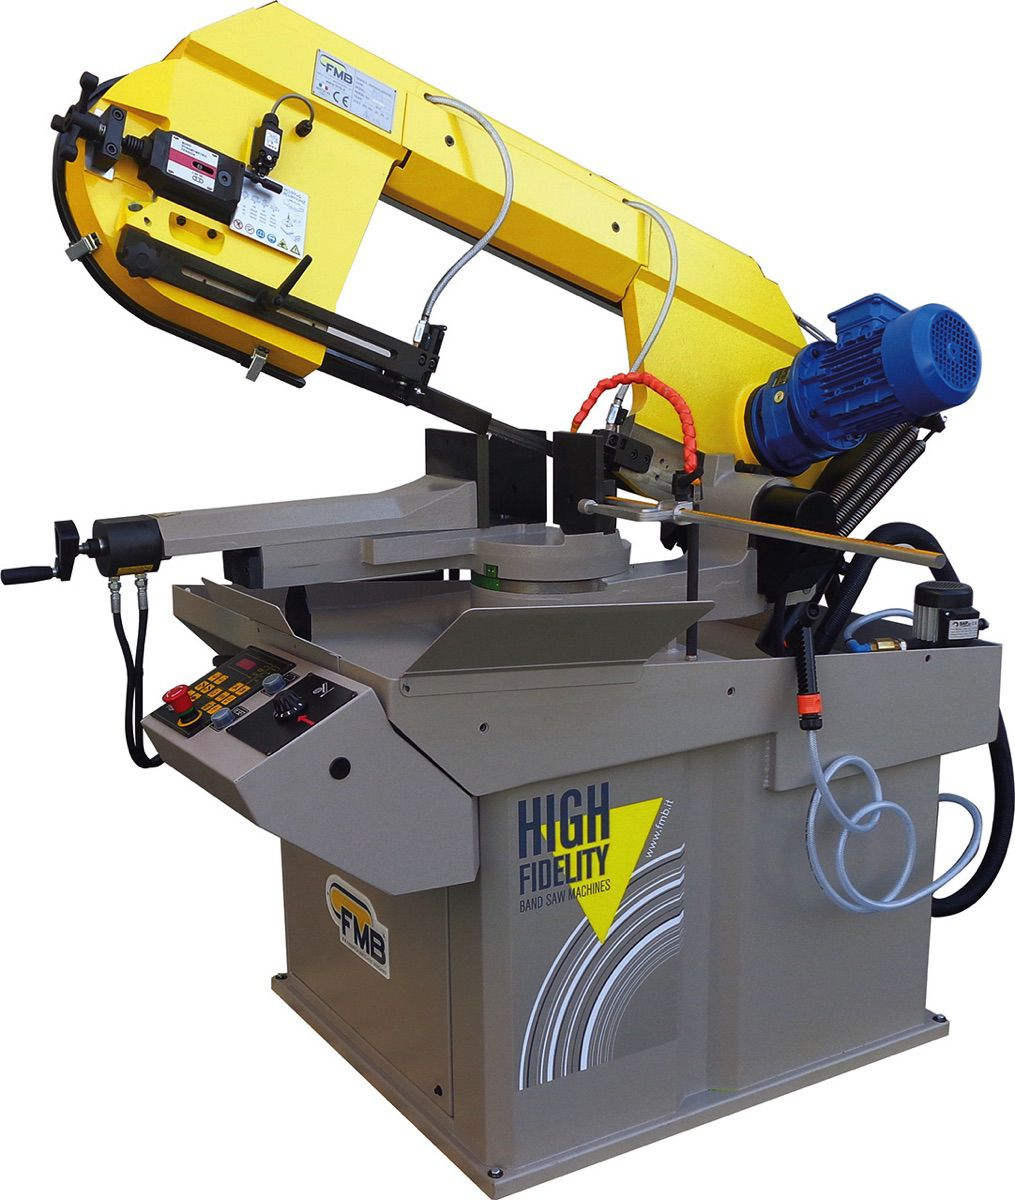 fmb mercuryvhz half automatische lintzaagmachine